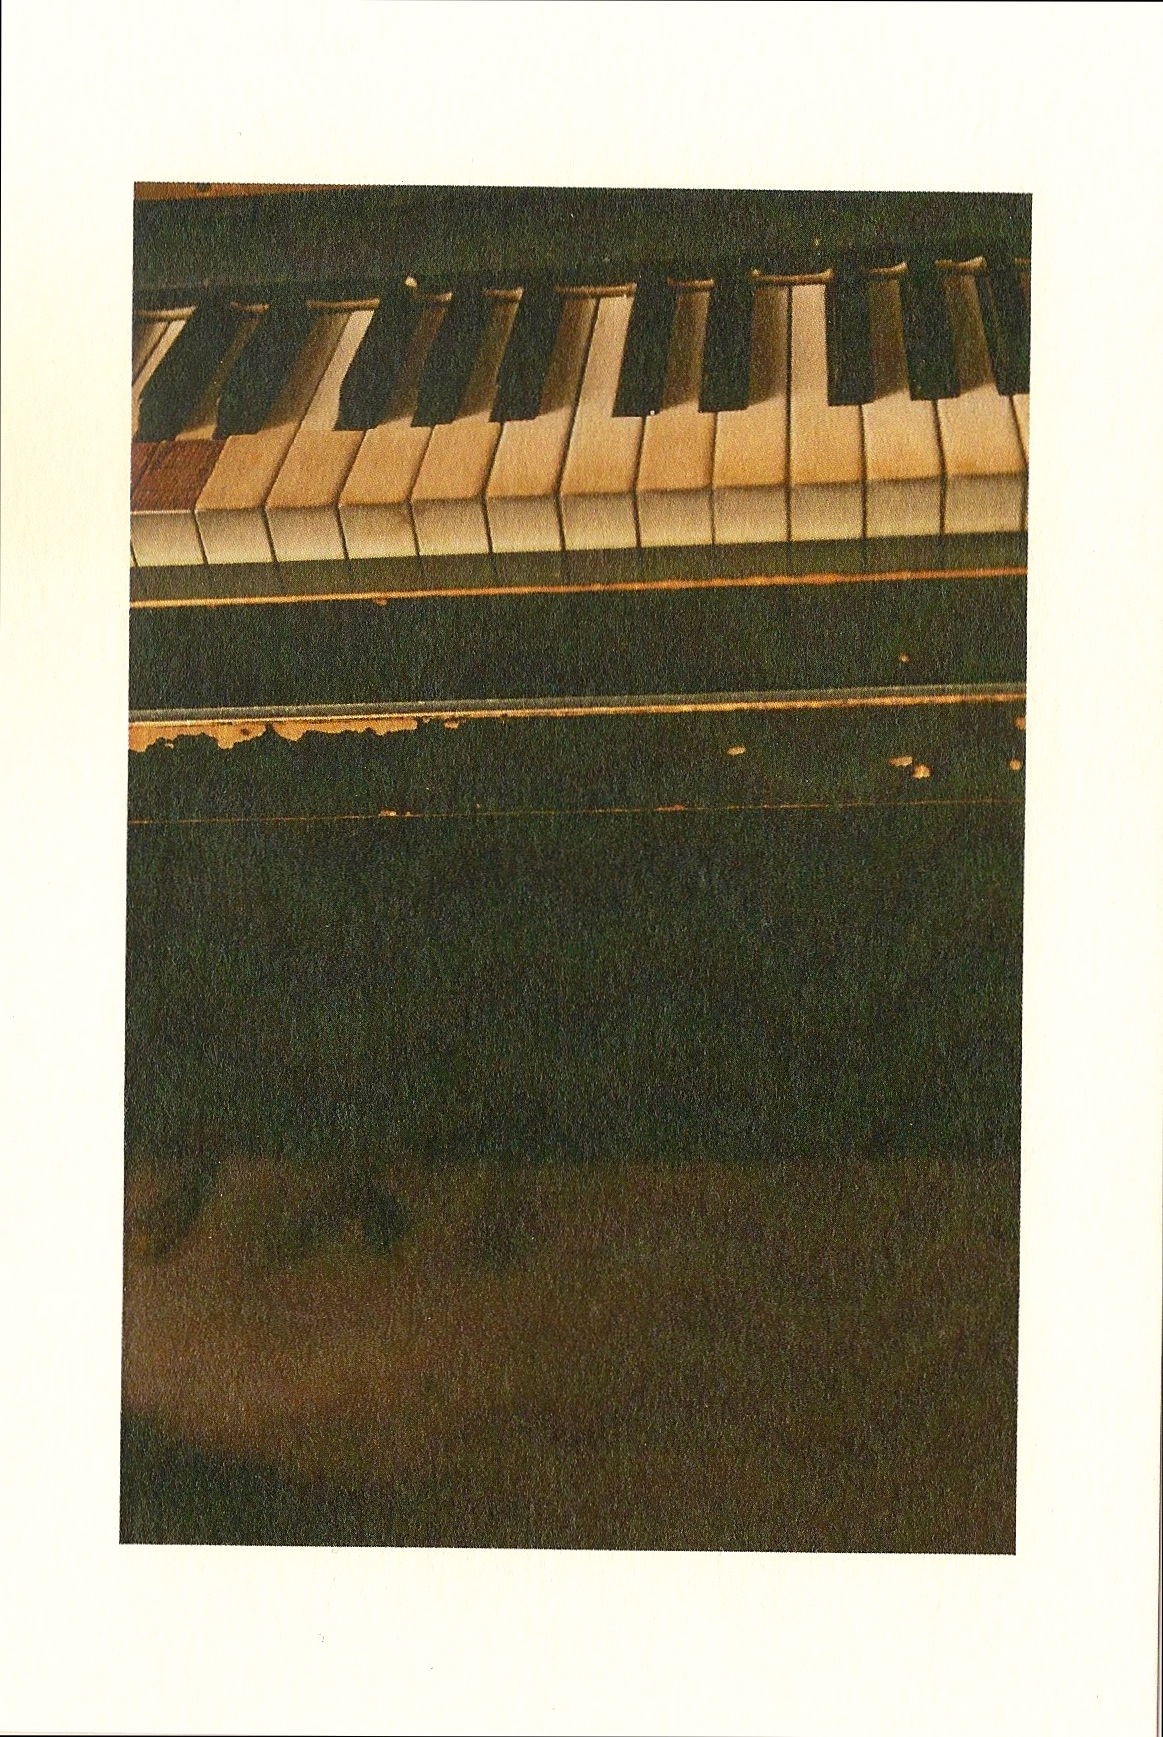 Yukari Matsuda, 2009, from limited copied post cards